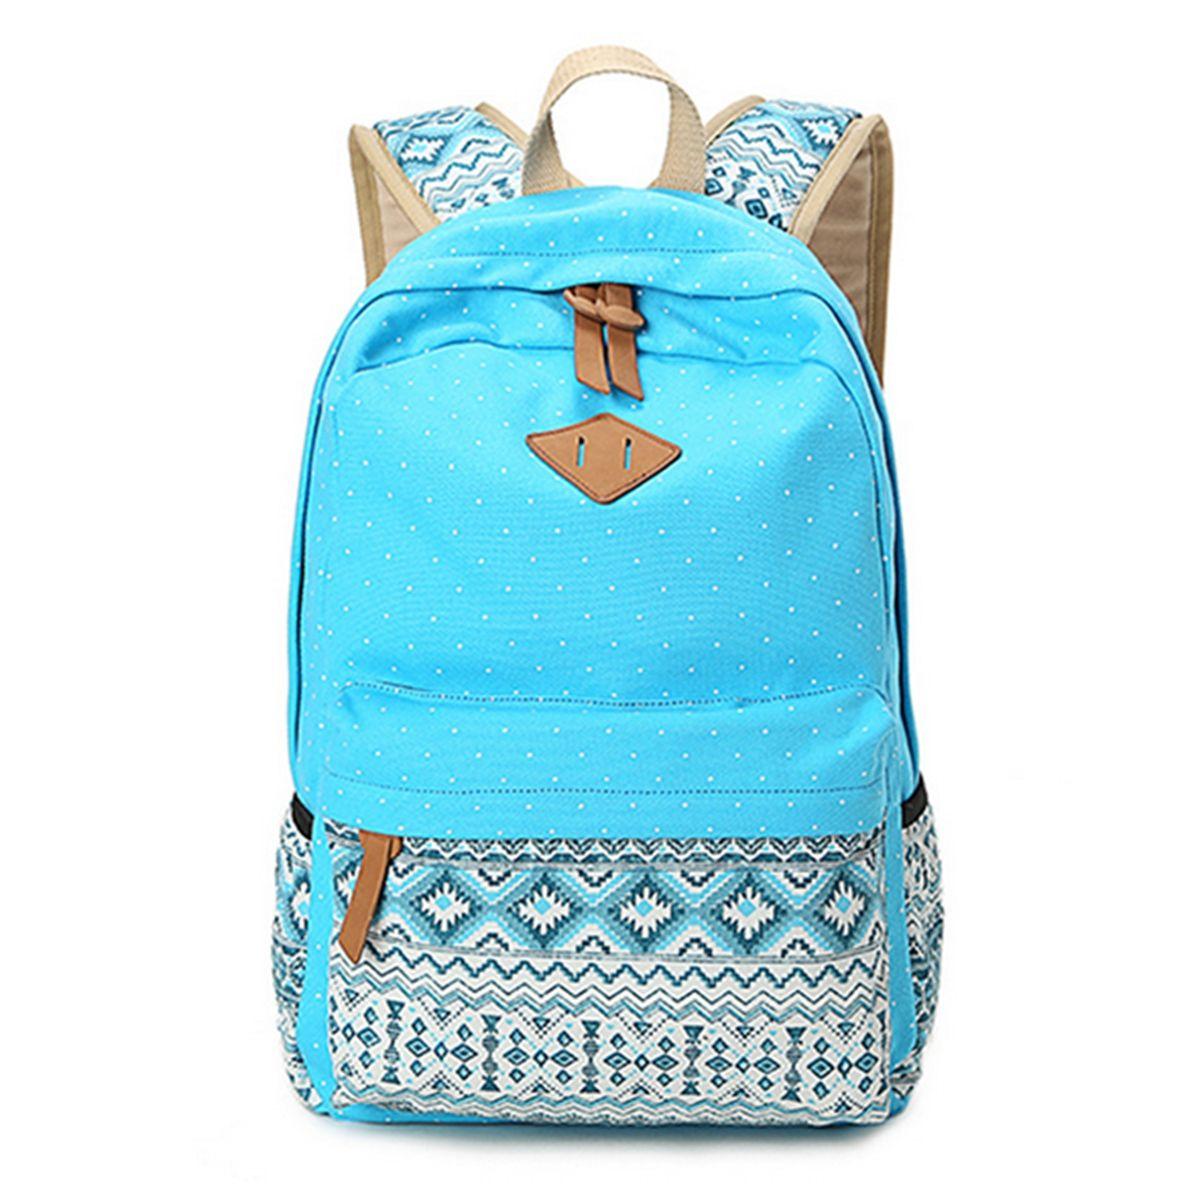 New-Ladies-Girls-Canvas-Vintage-Backpack-Rucksack-College-Shoulder ...